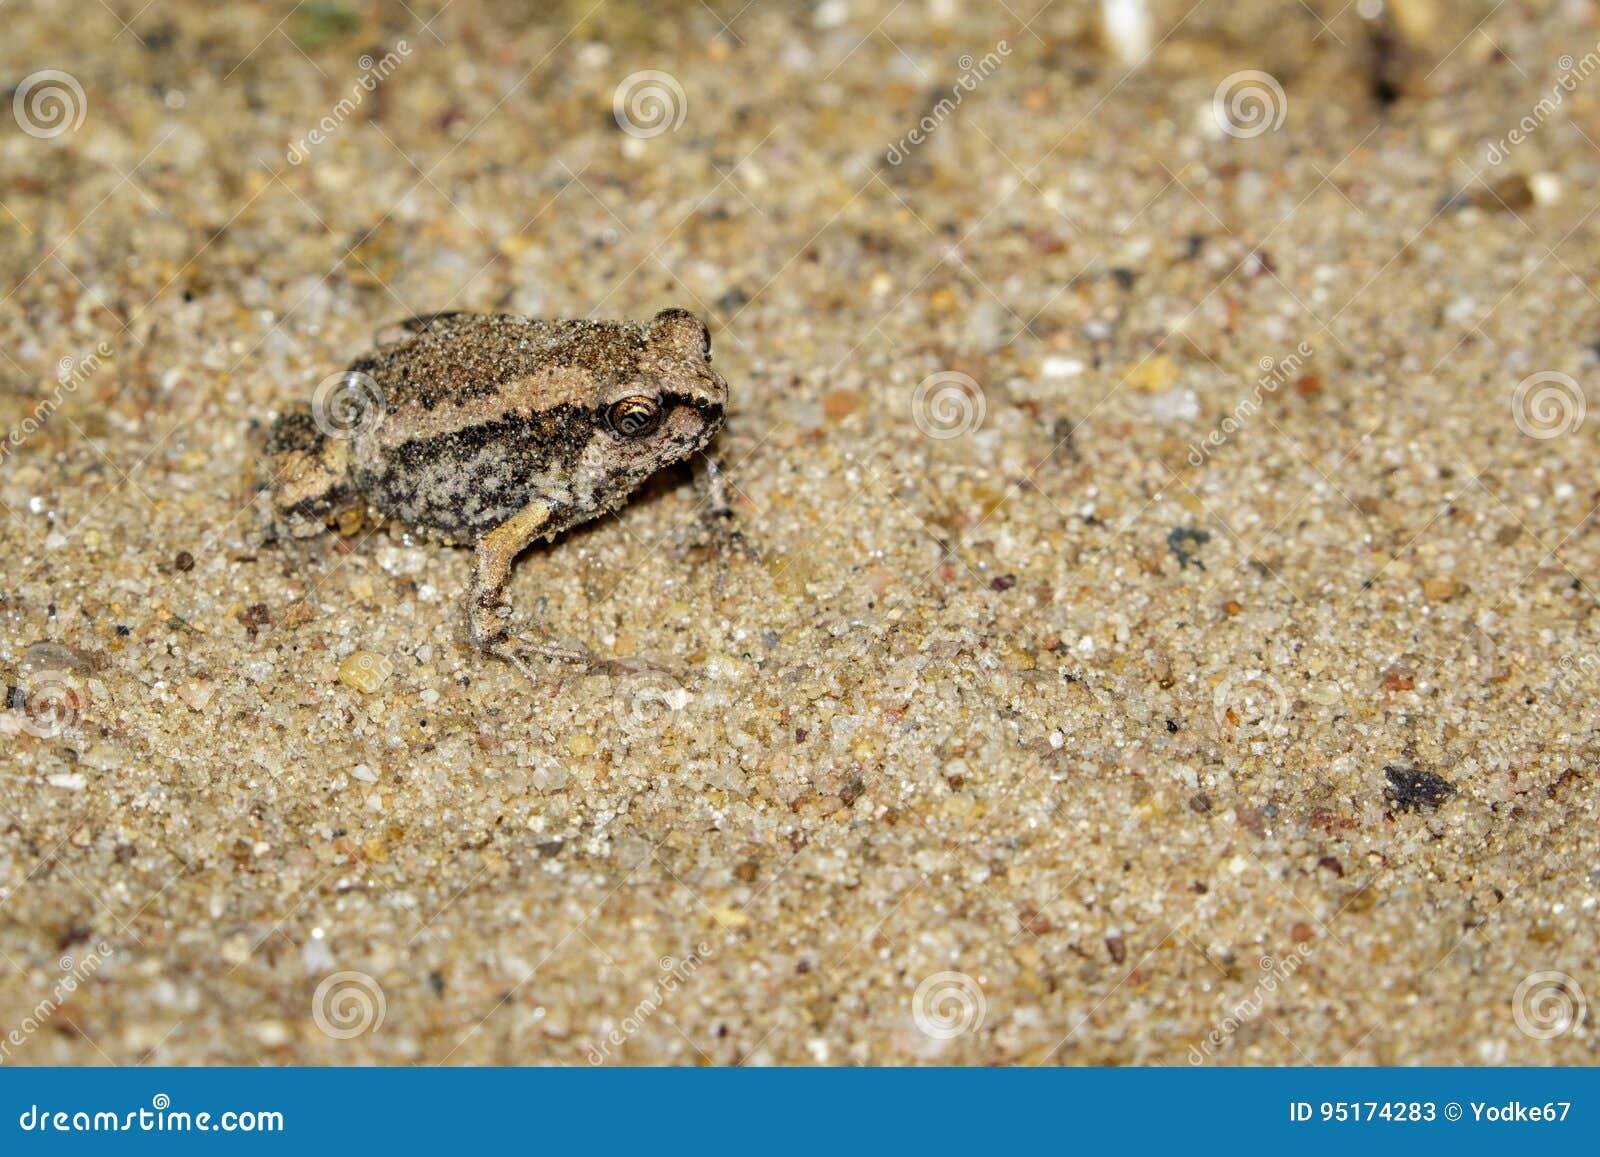 Image of little bullfrog Kaloula pulchra on the ground.